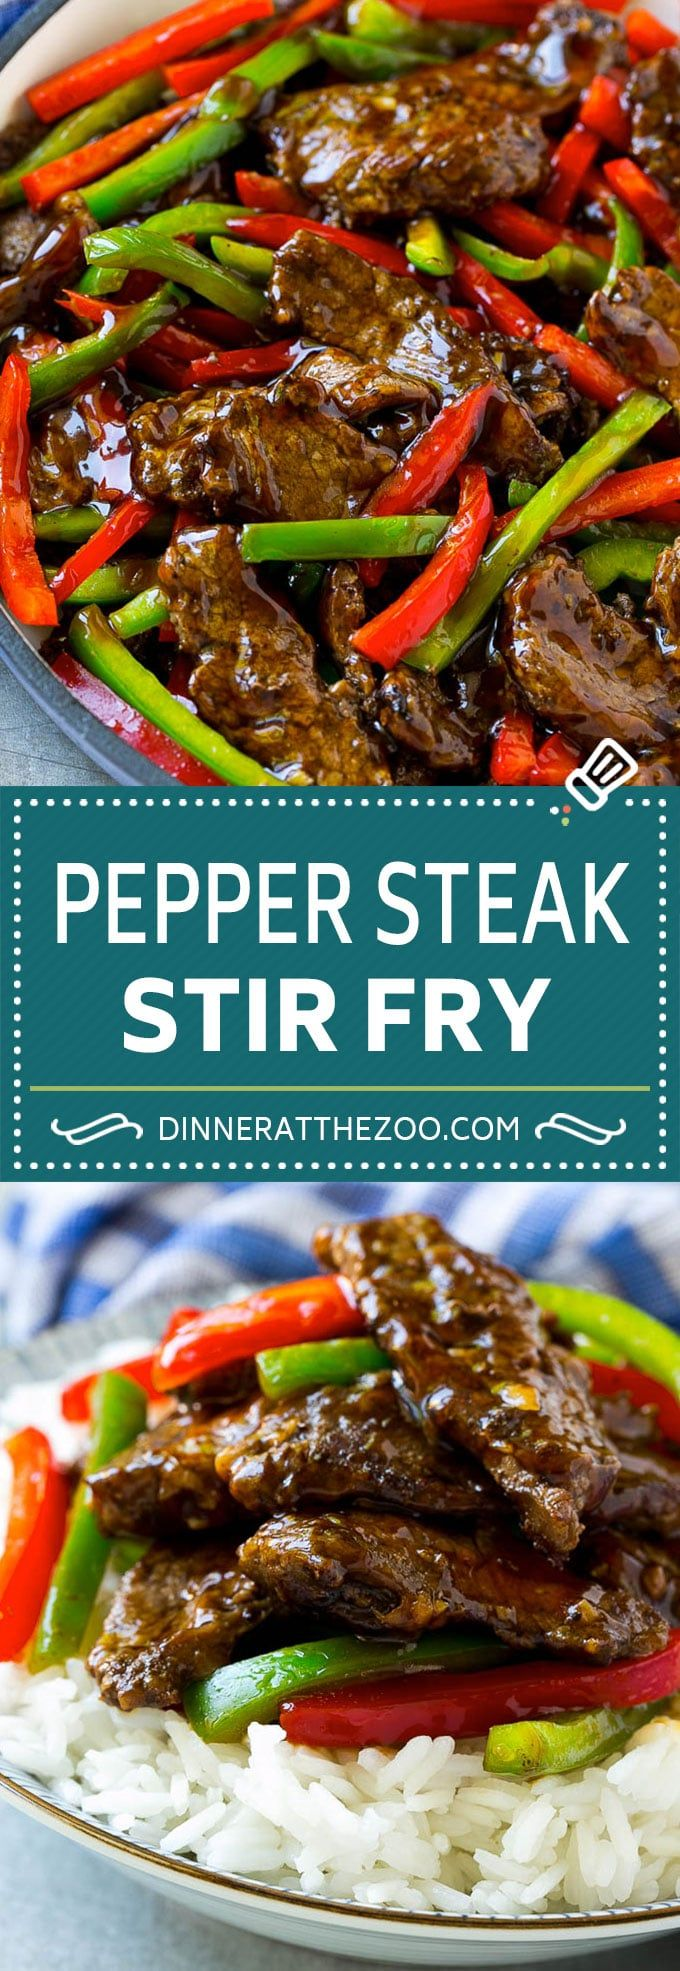 Pepper Steak Stir Fry Recipe | Chinese Pepper Steak | Steak Stir Fry | Beef Stir Fry #steak #peppers #stirfry #chinesefood #dinneratthezoo #beef #bellpepperrecipes